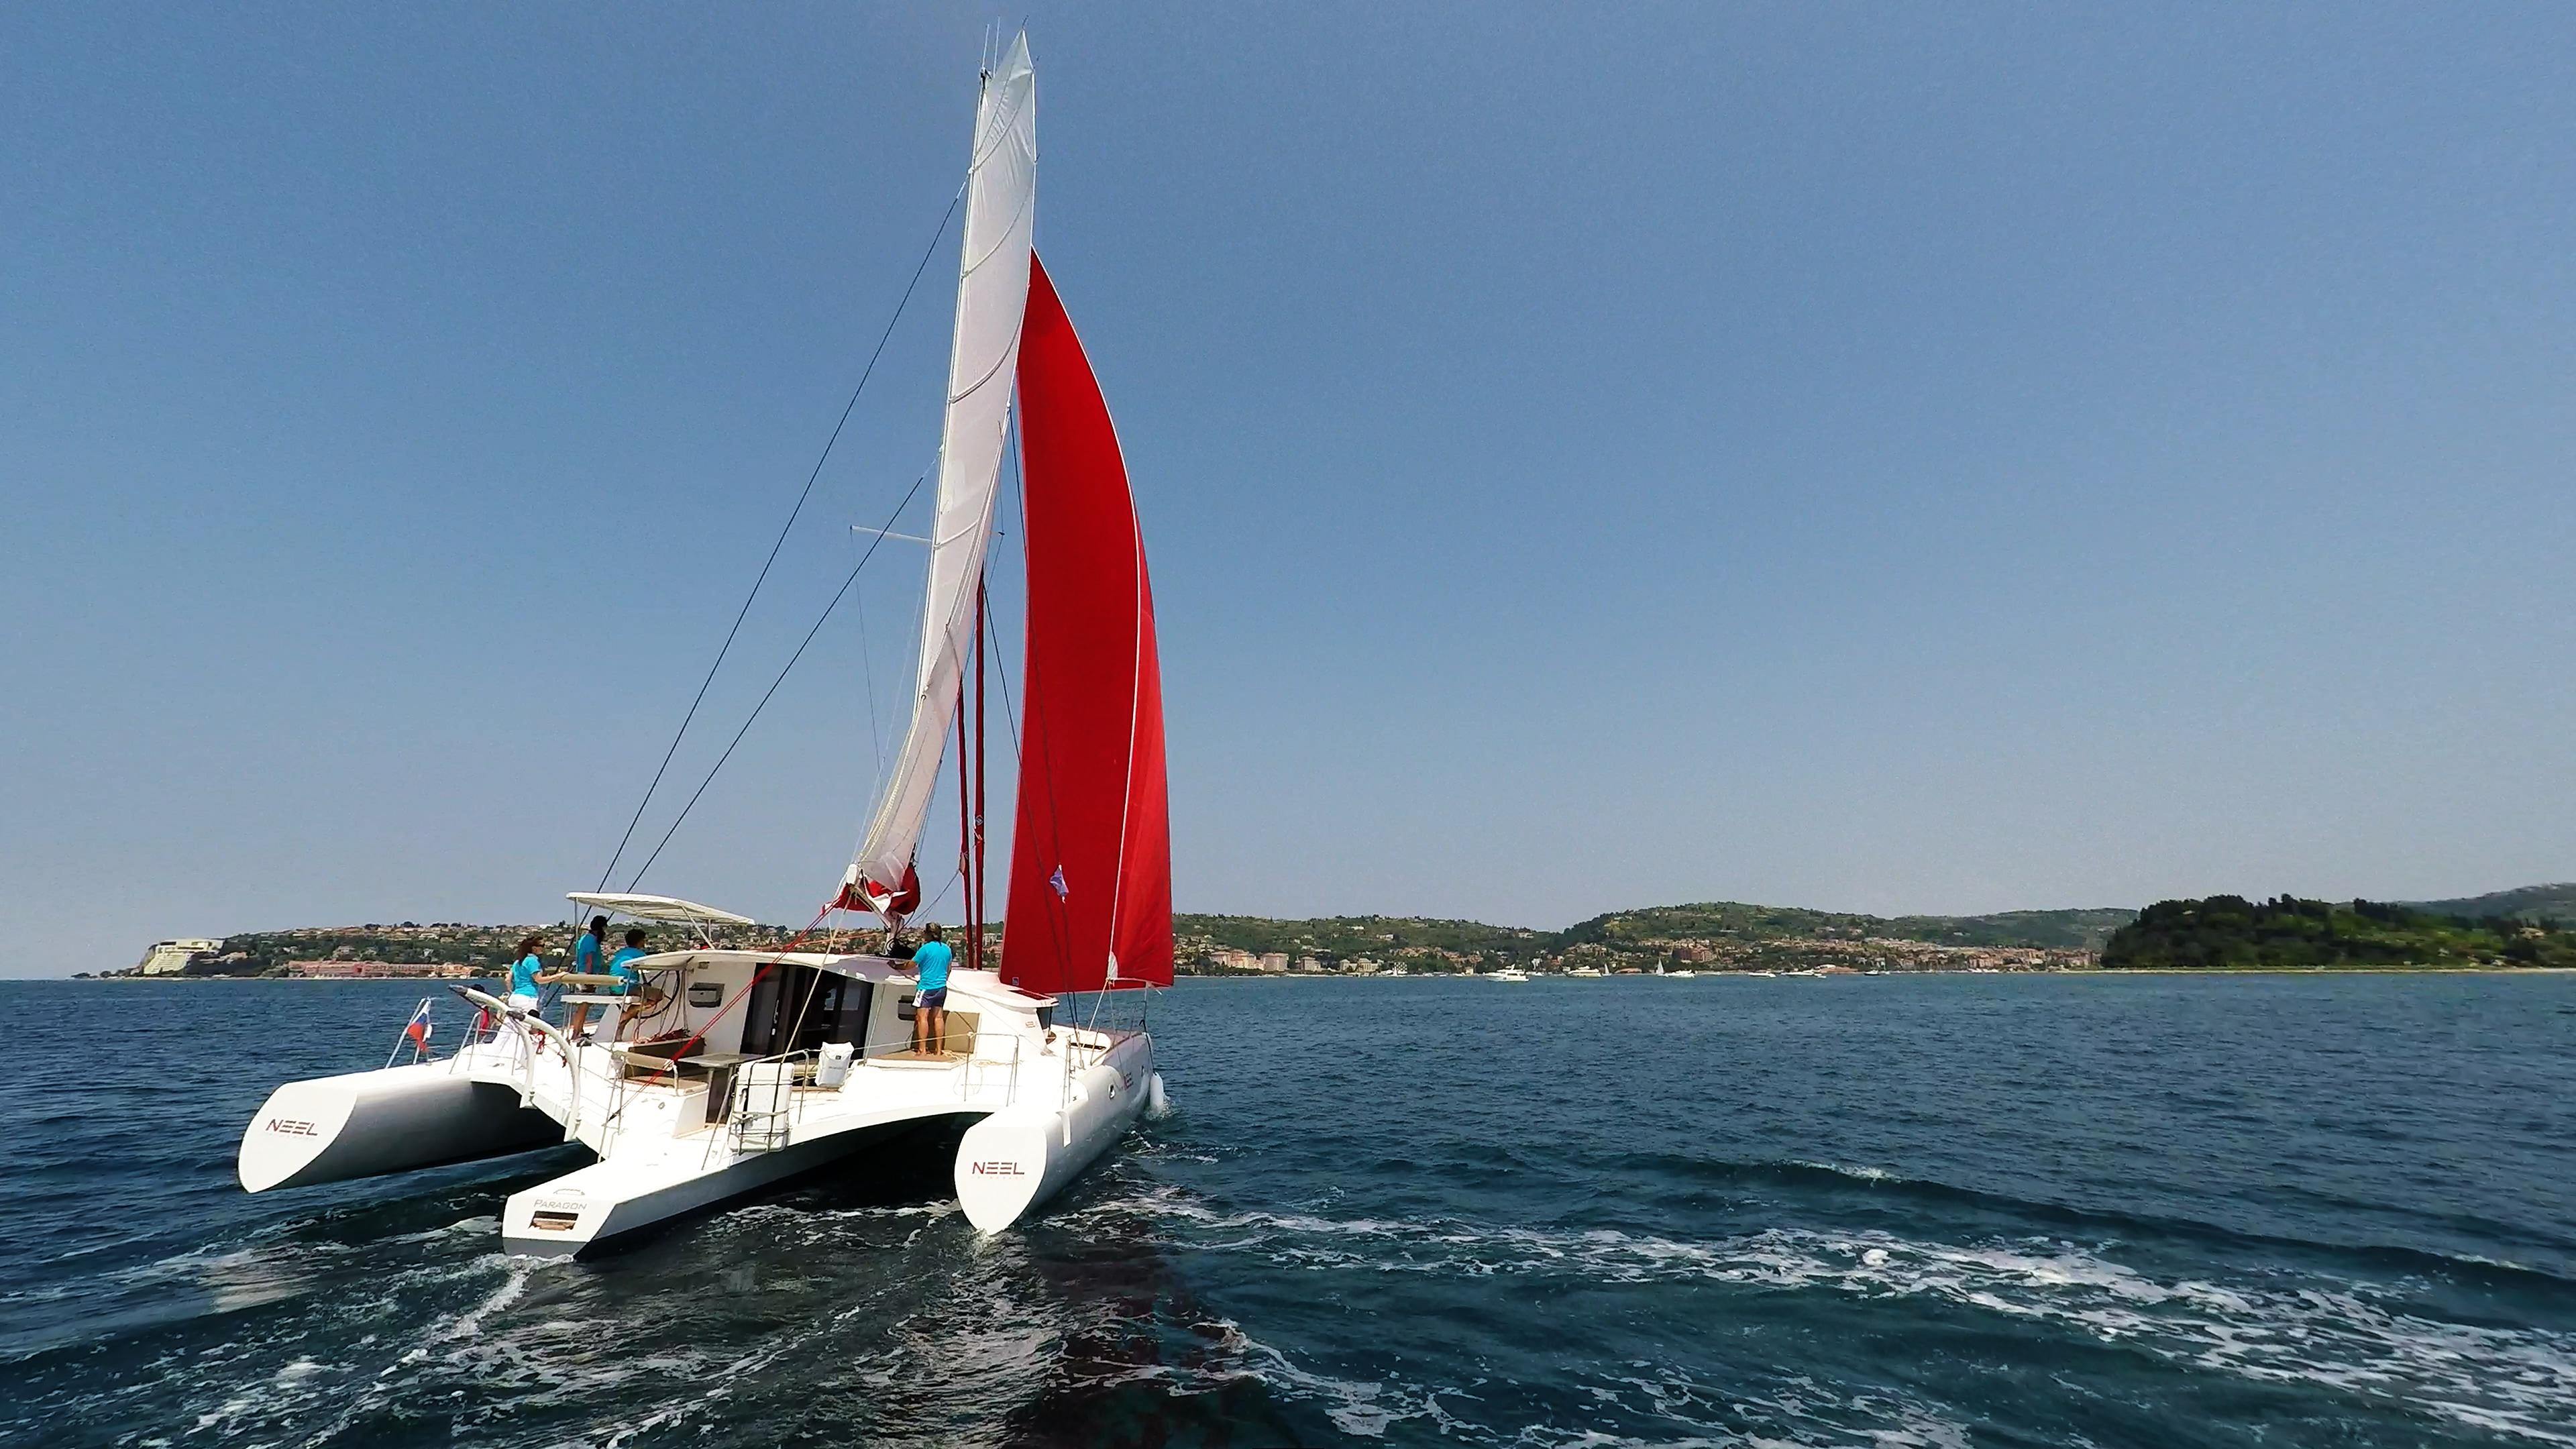 stern view of sailing multihull yacht